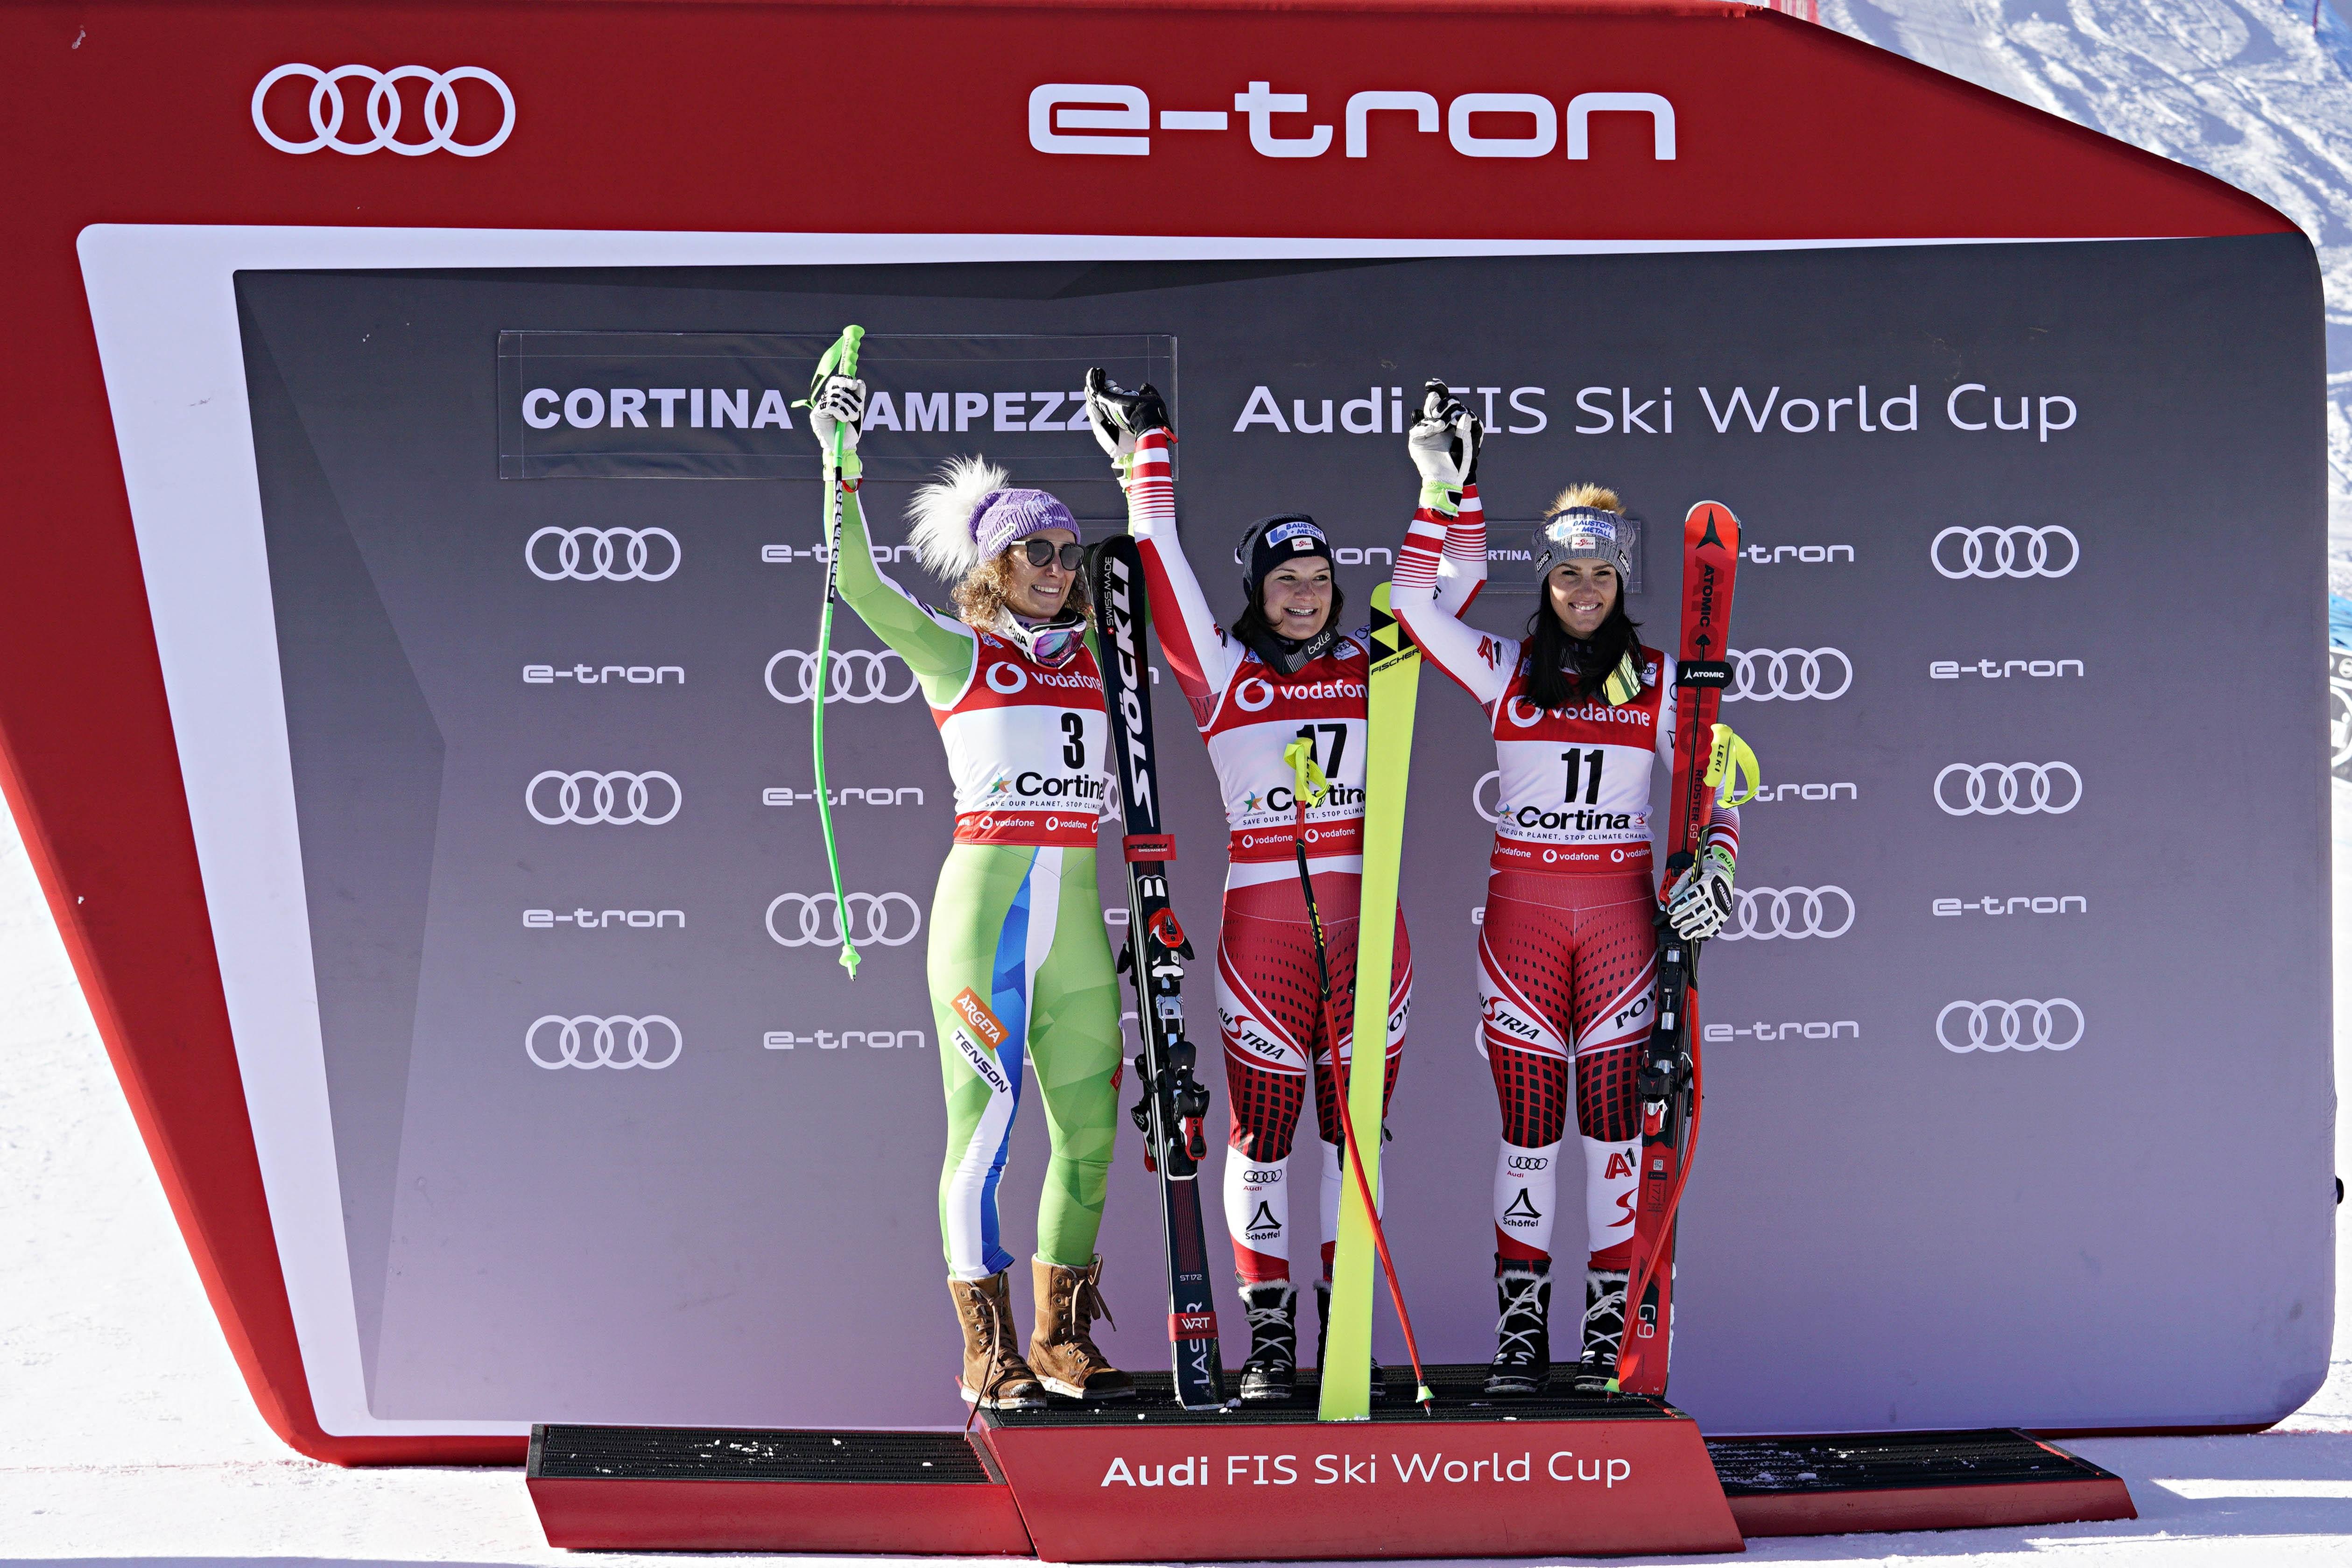 Ilka Stuhec, Ramona Siebenhofer, Stephanie Venier sur le podium de la descente de Cortina d'Ampezzo le 18 janvier 2019